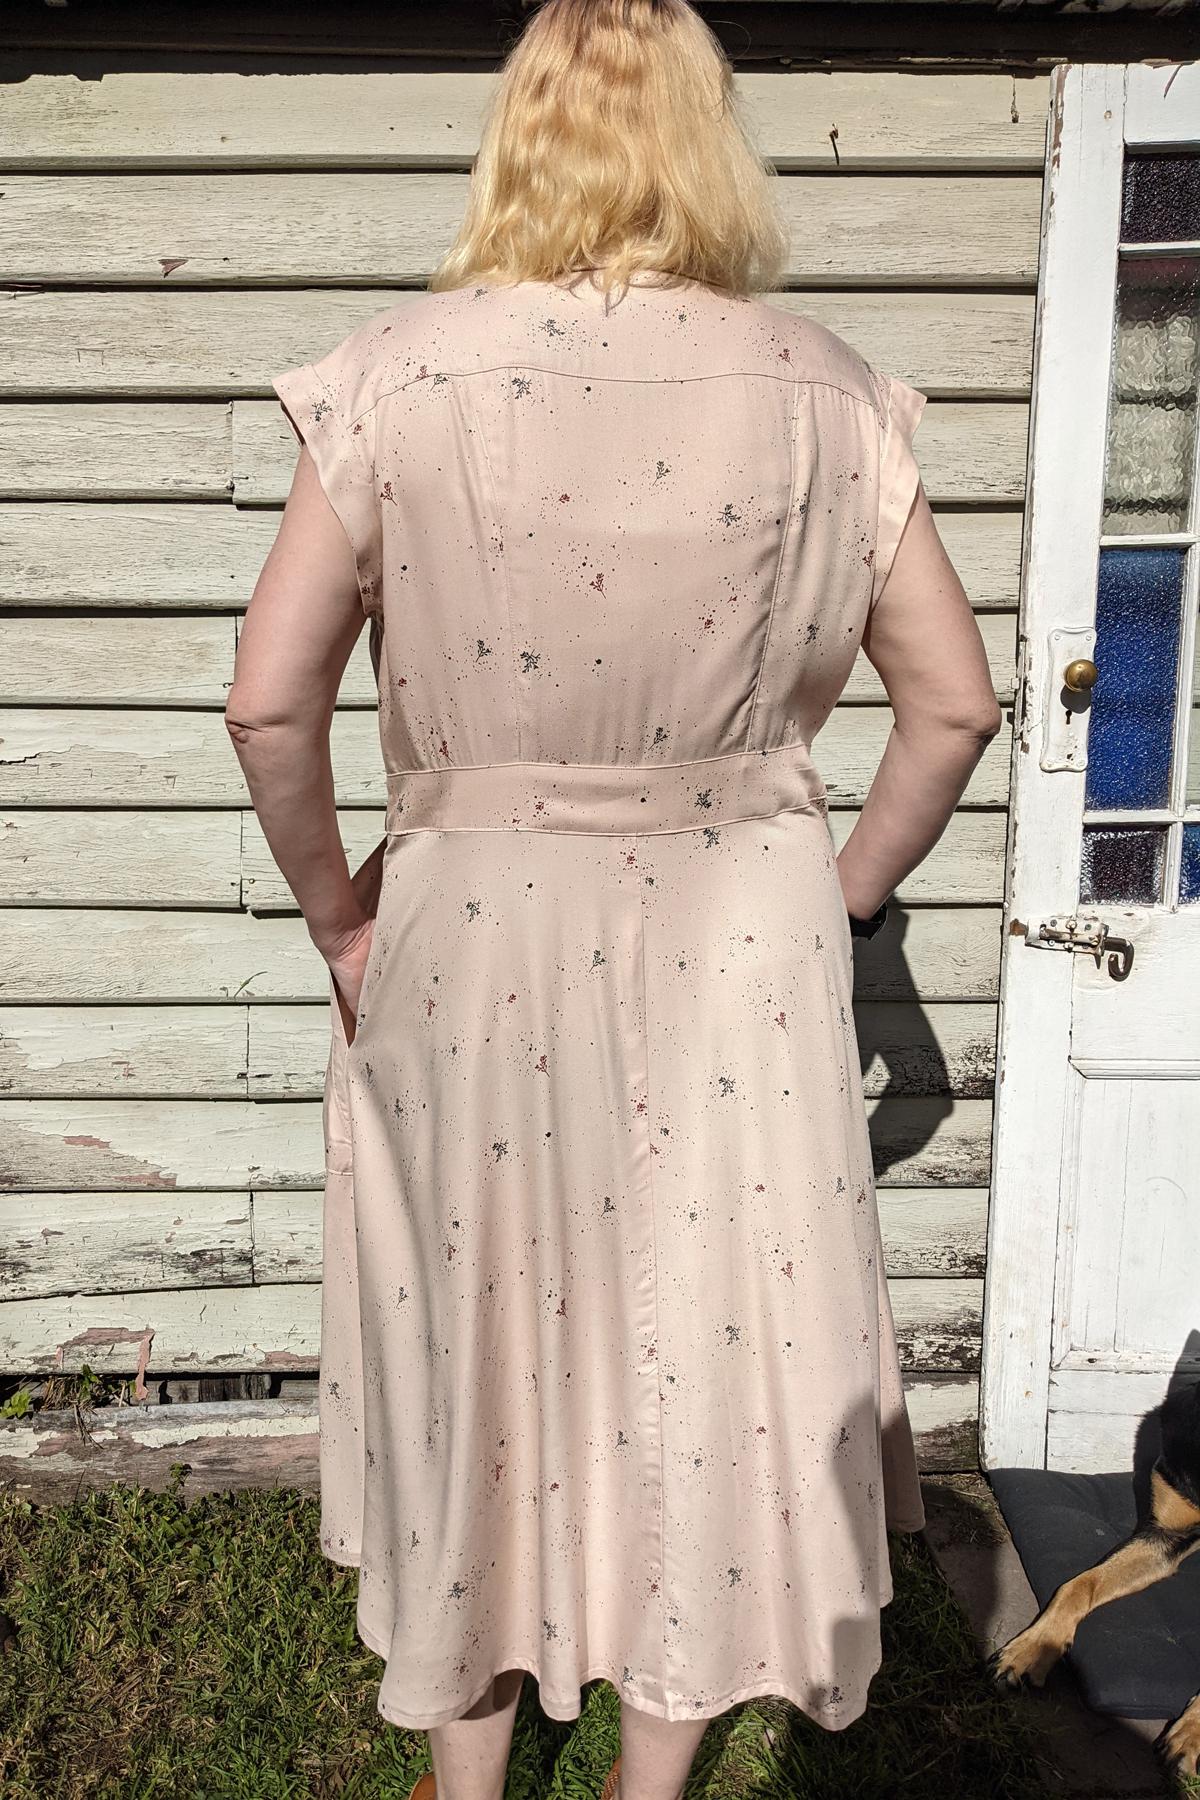 Chloe's Matilda dress